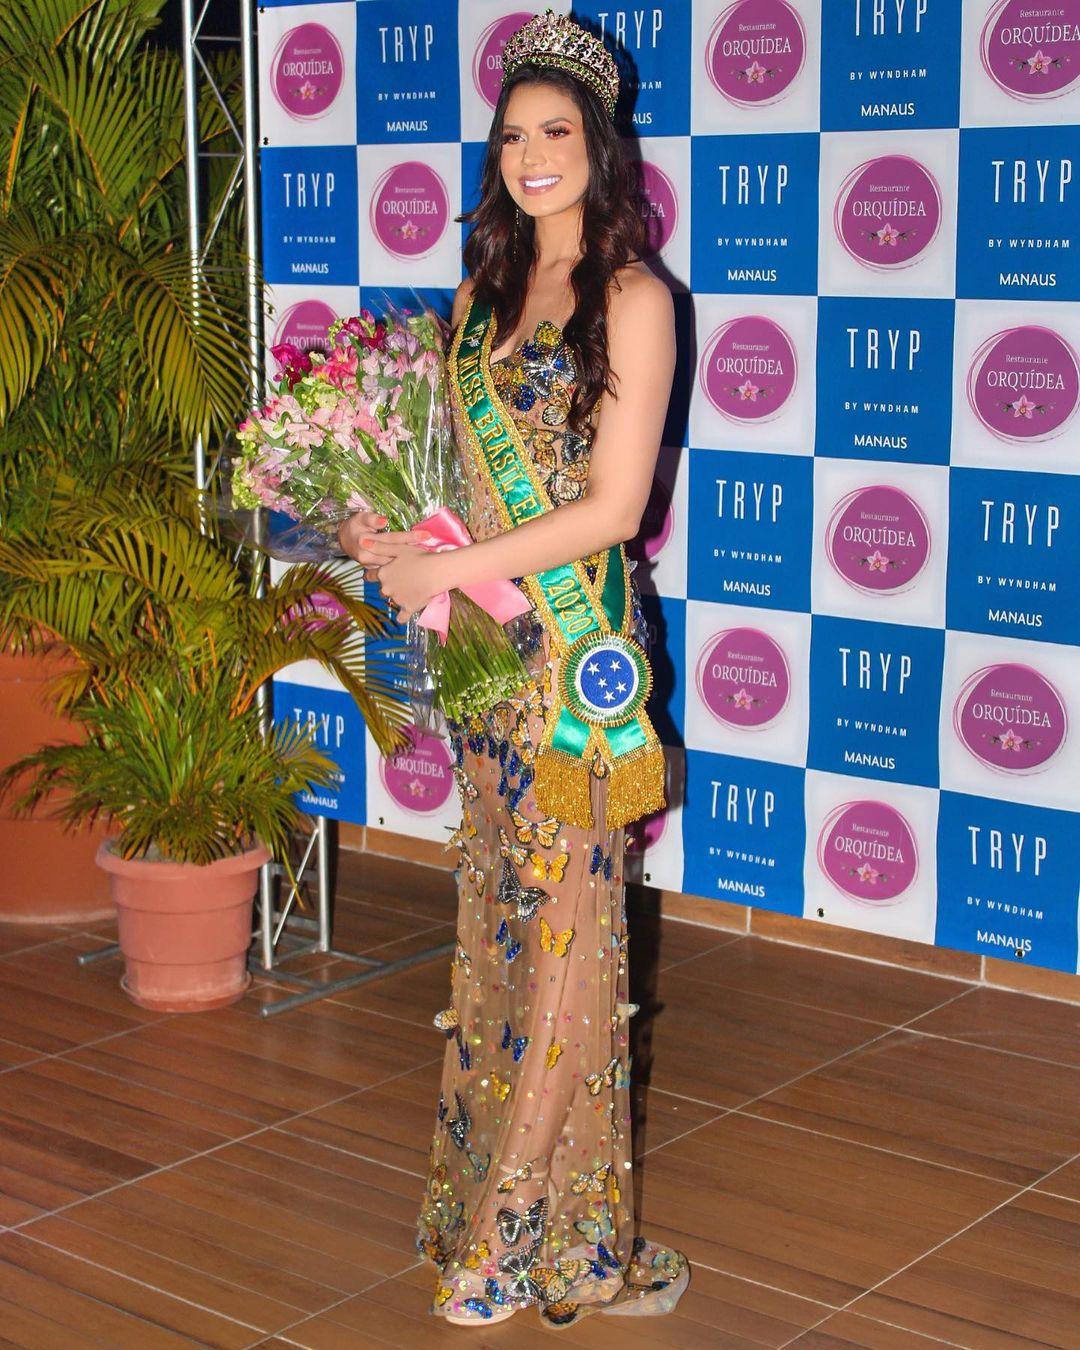 thais bergamini, miss terra brasil 2020. Thaisb21